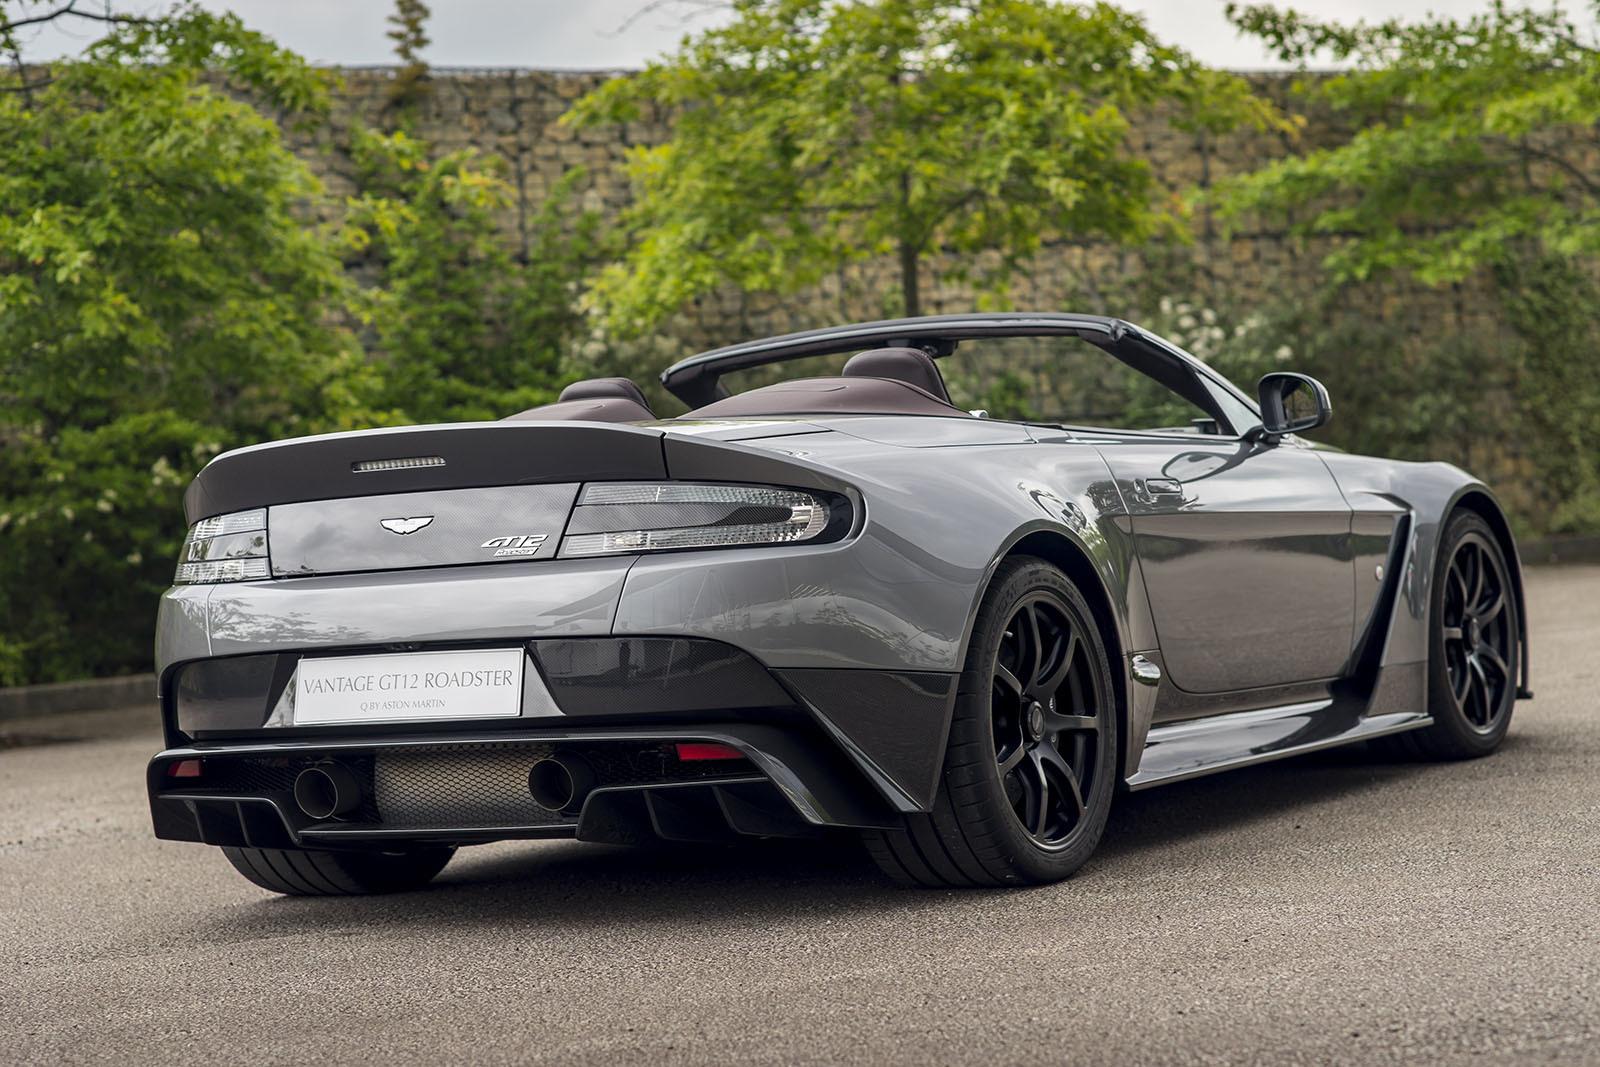 Aston Martin Vantage GT12 Roadster Wallpapers HD